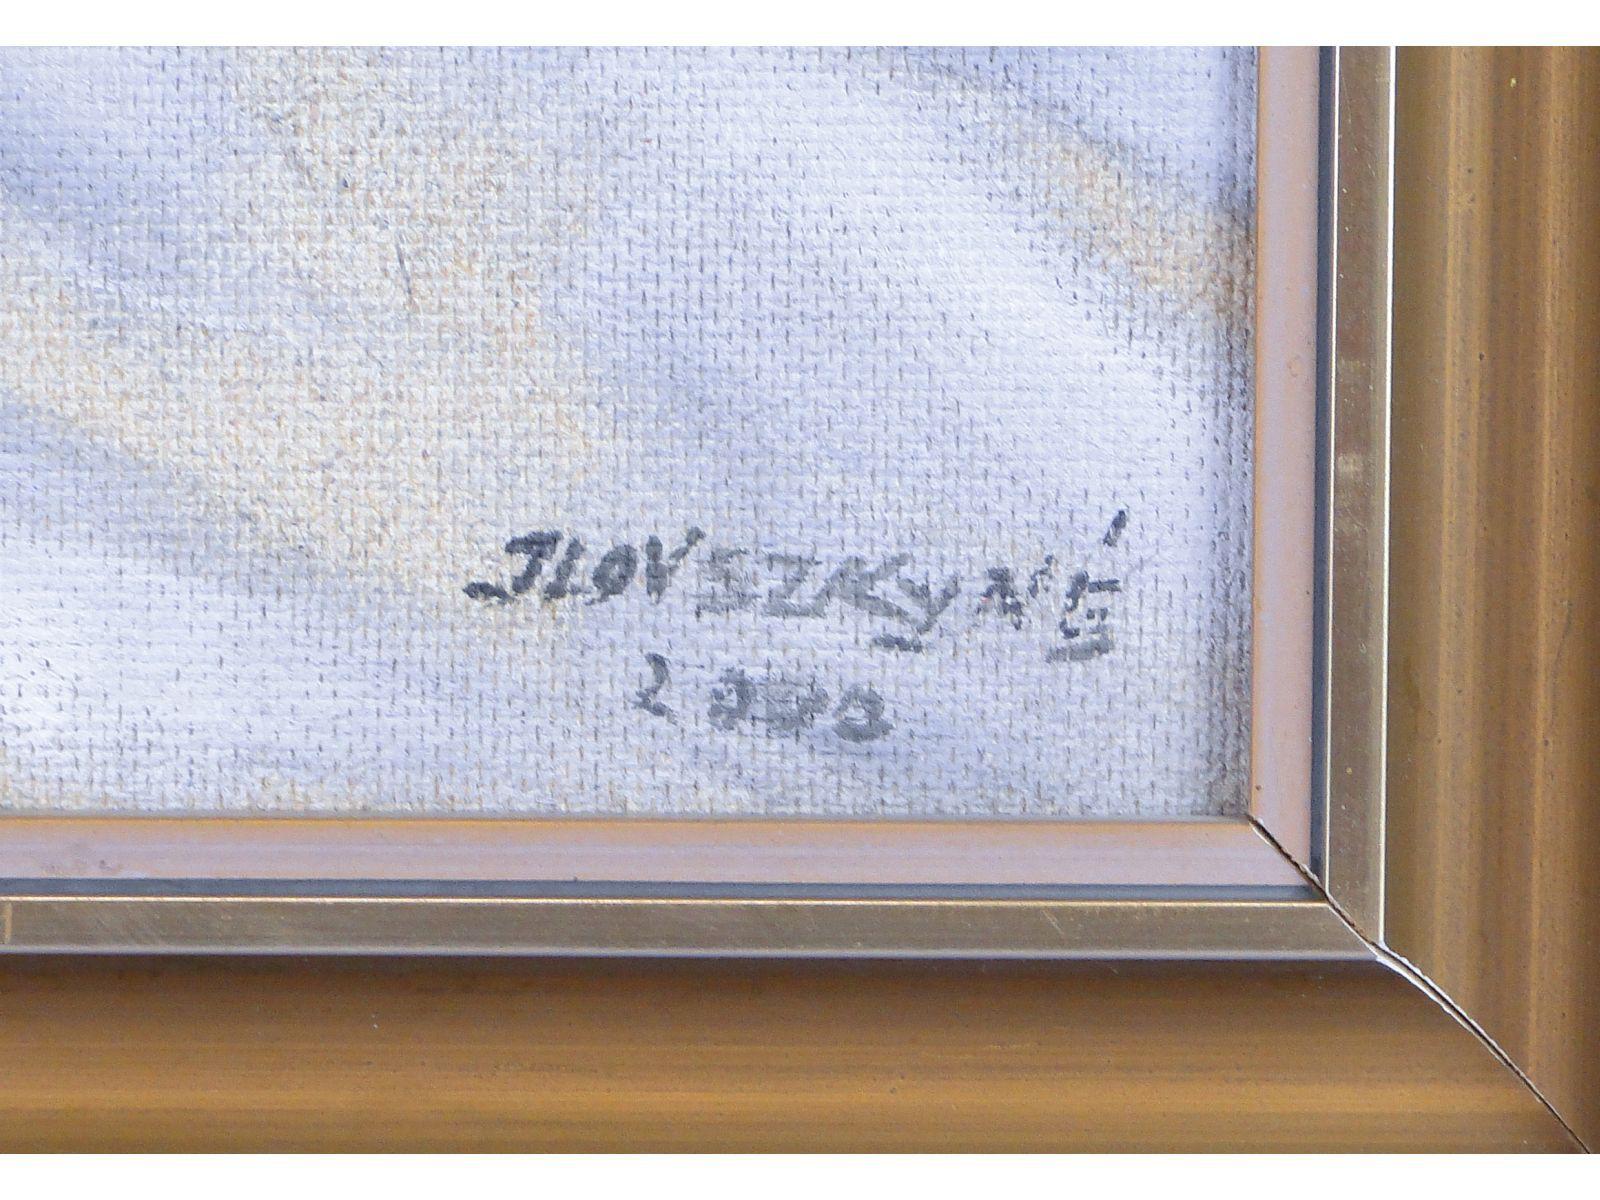 DSC05092.JPG (1600×1200)